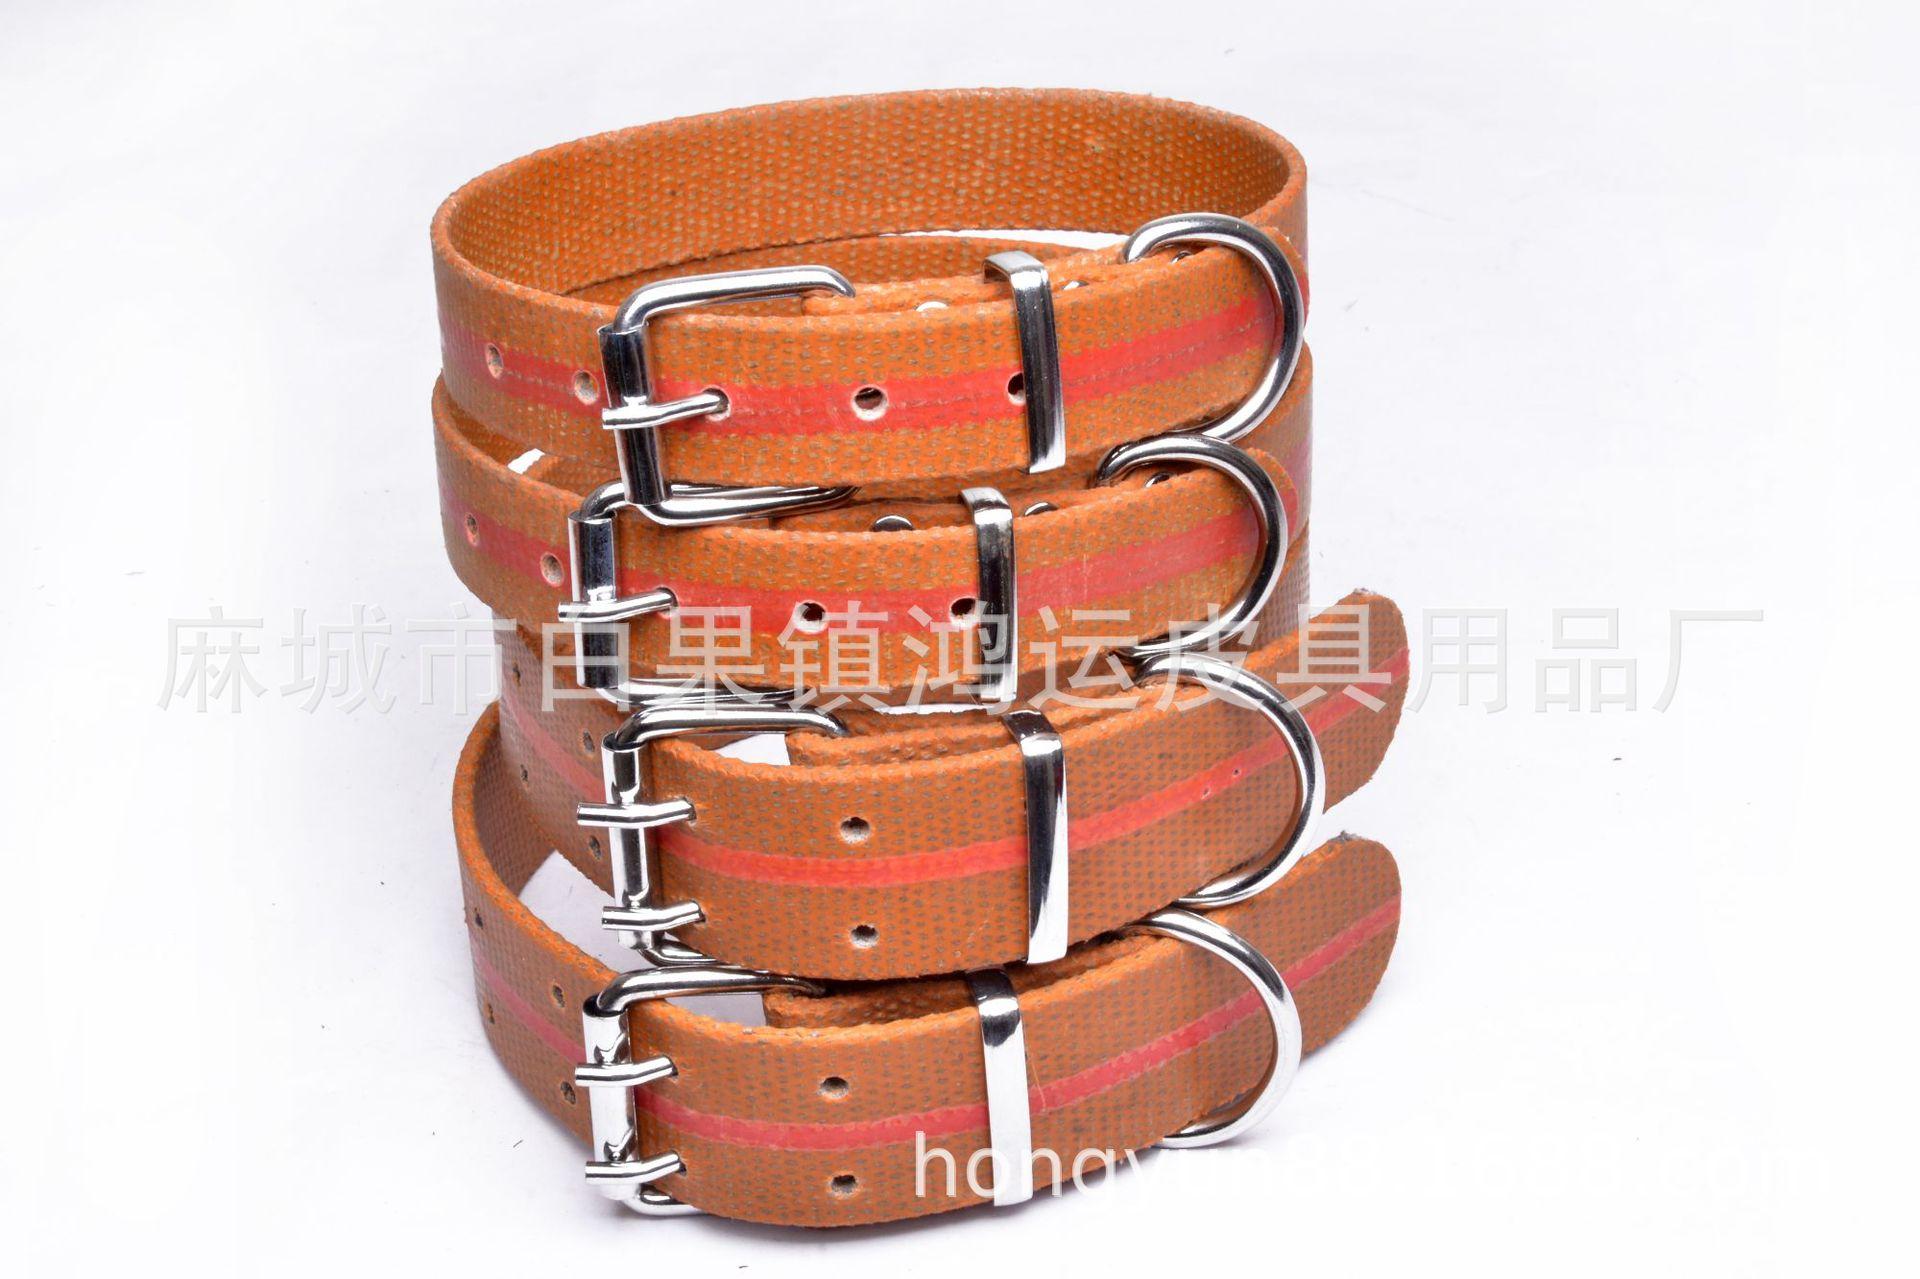 Dog Kept Pulling Constantly Dogs Rubber Bandana Large Fierce Dog Dog Collar Waterproof Anti-Bite Neck Ring